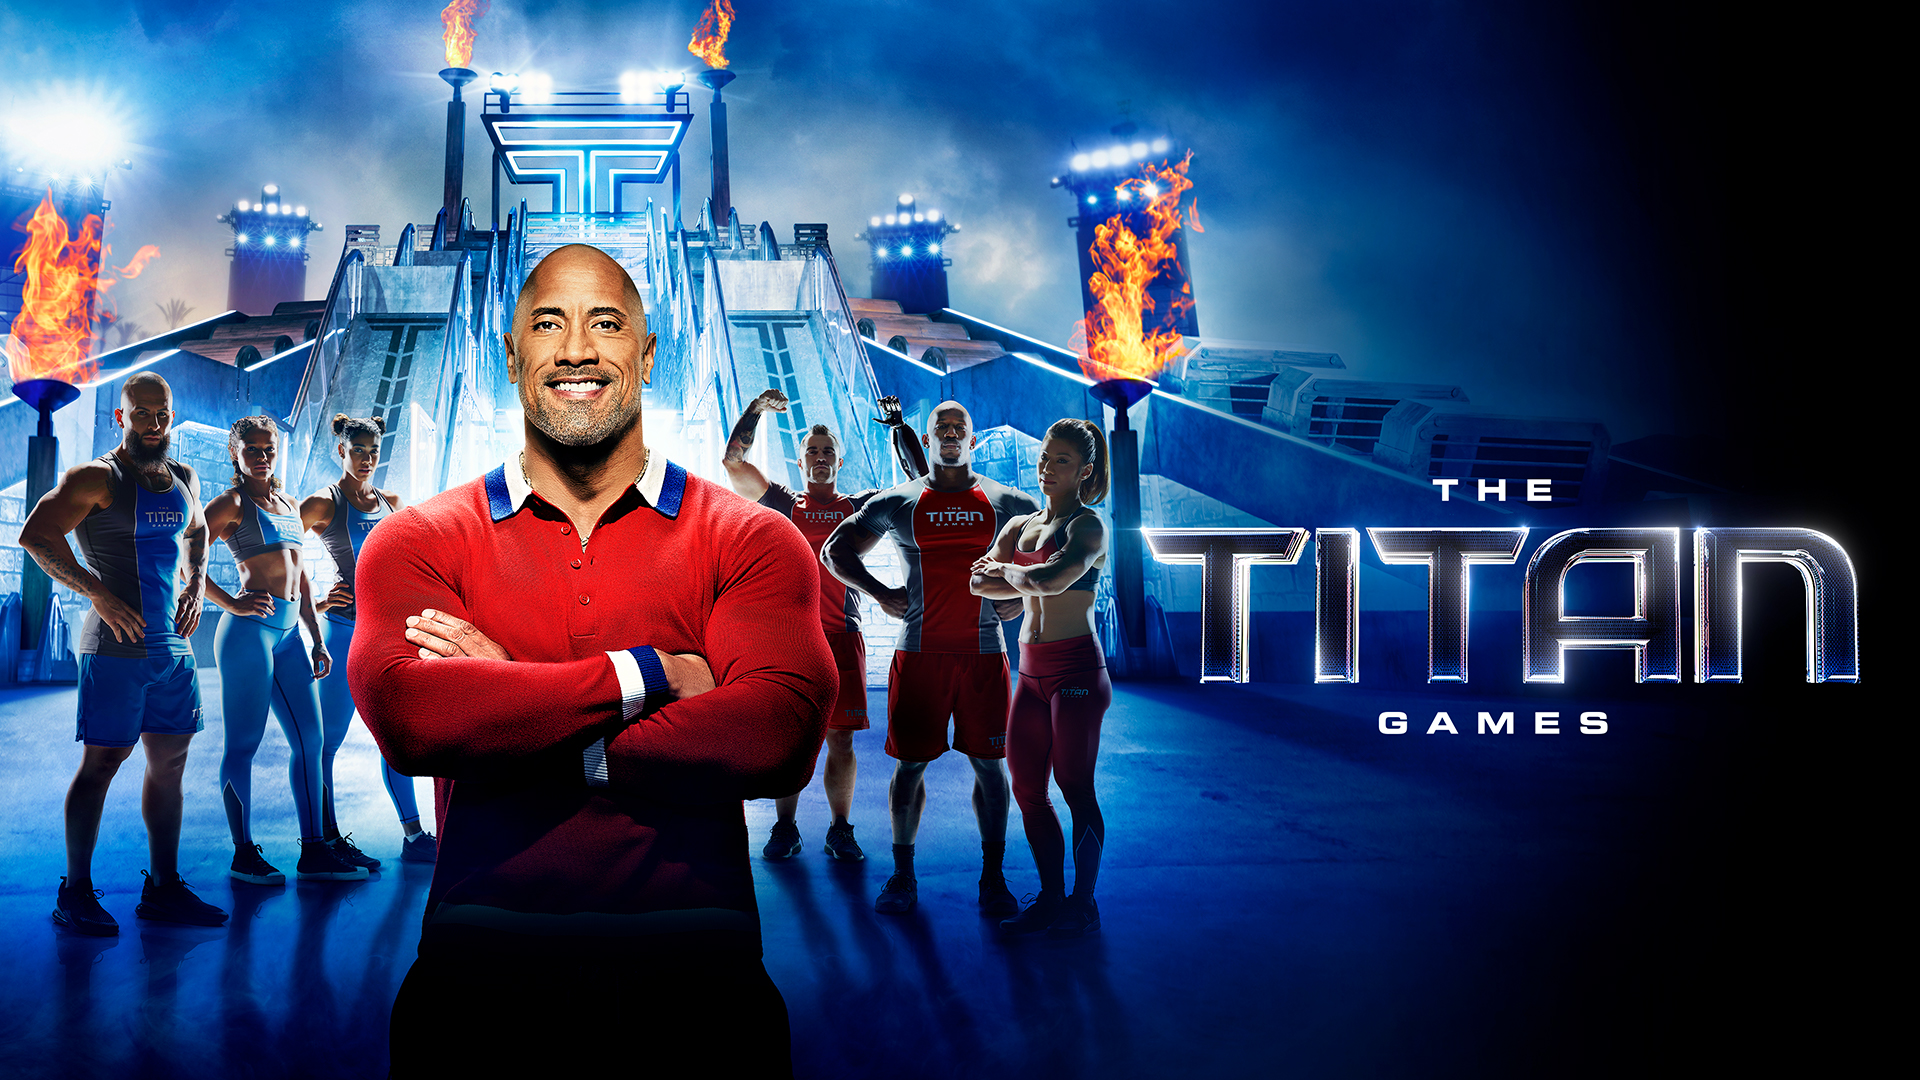 Watch The Titan Games Episodes - NBC com